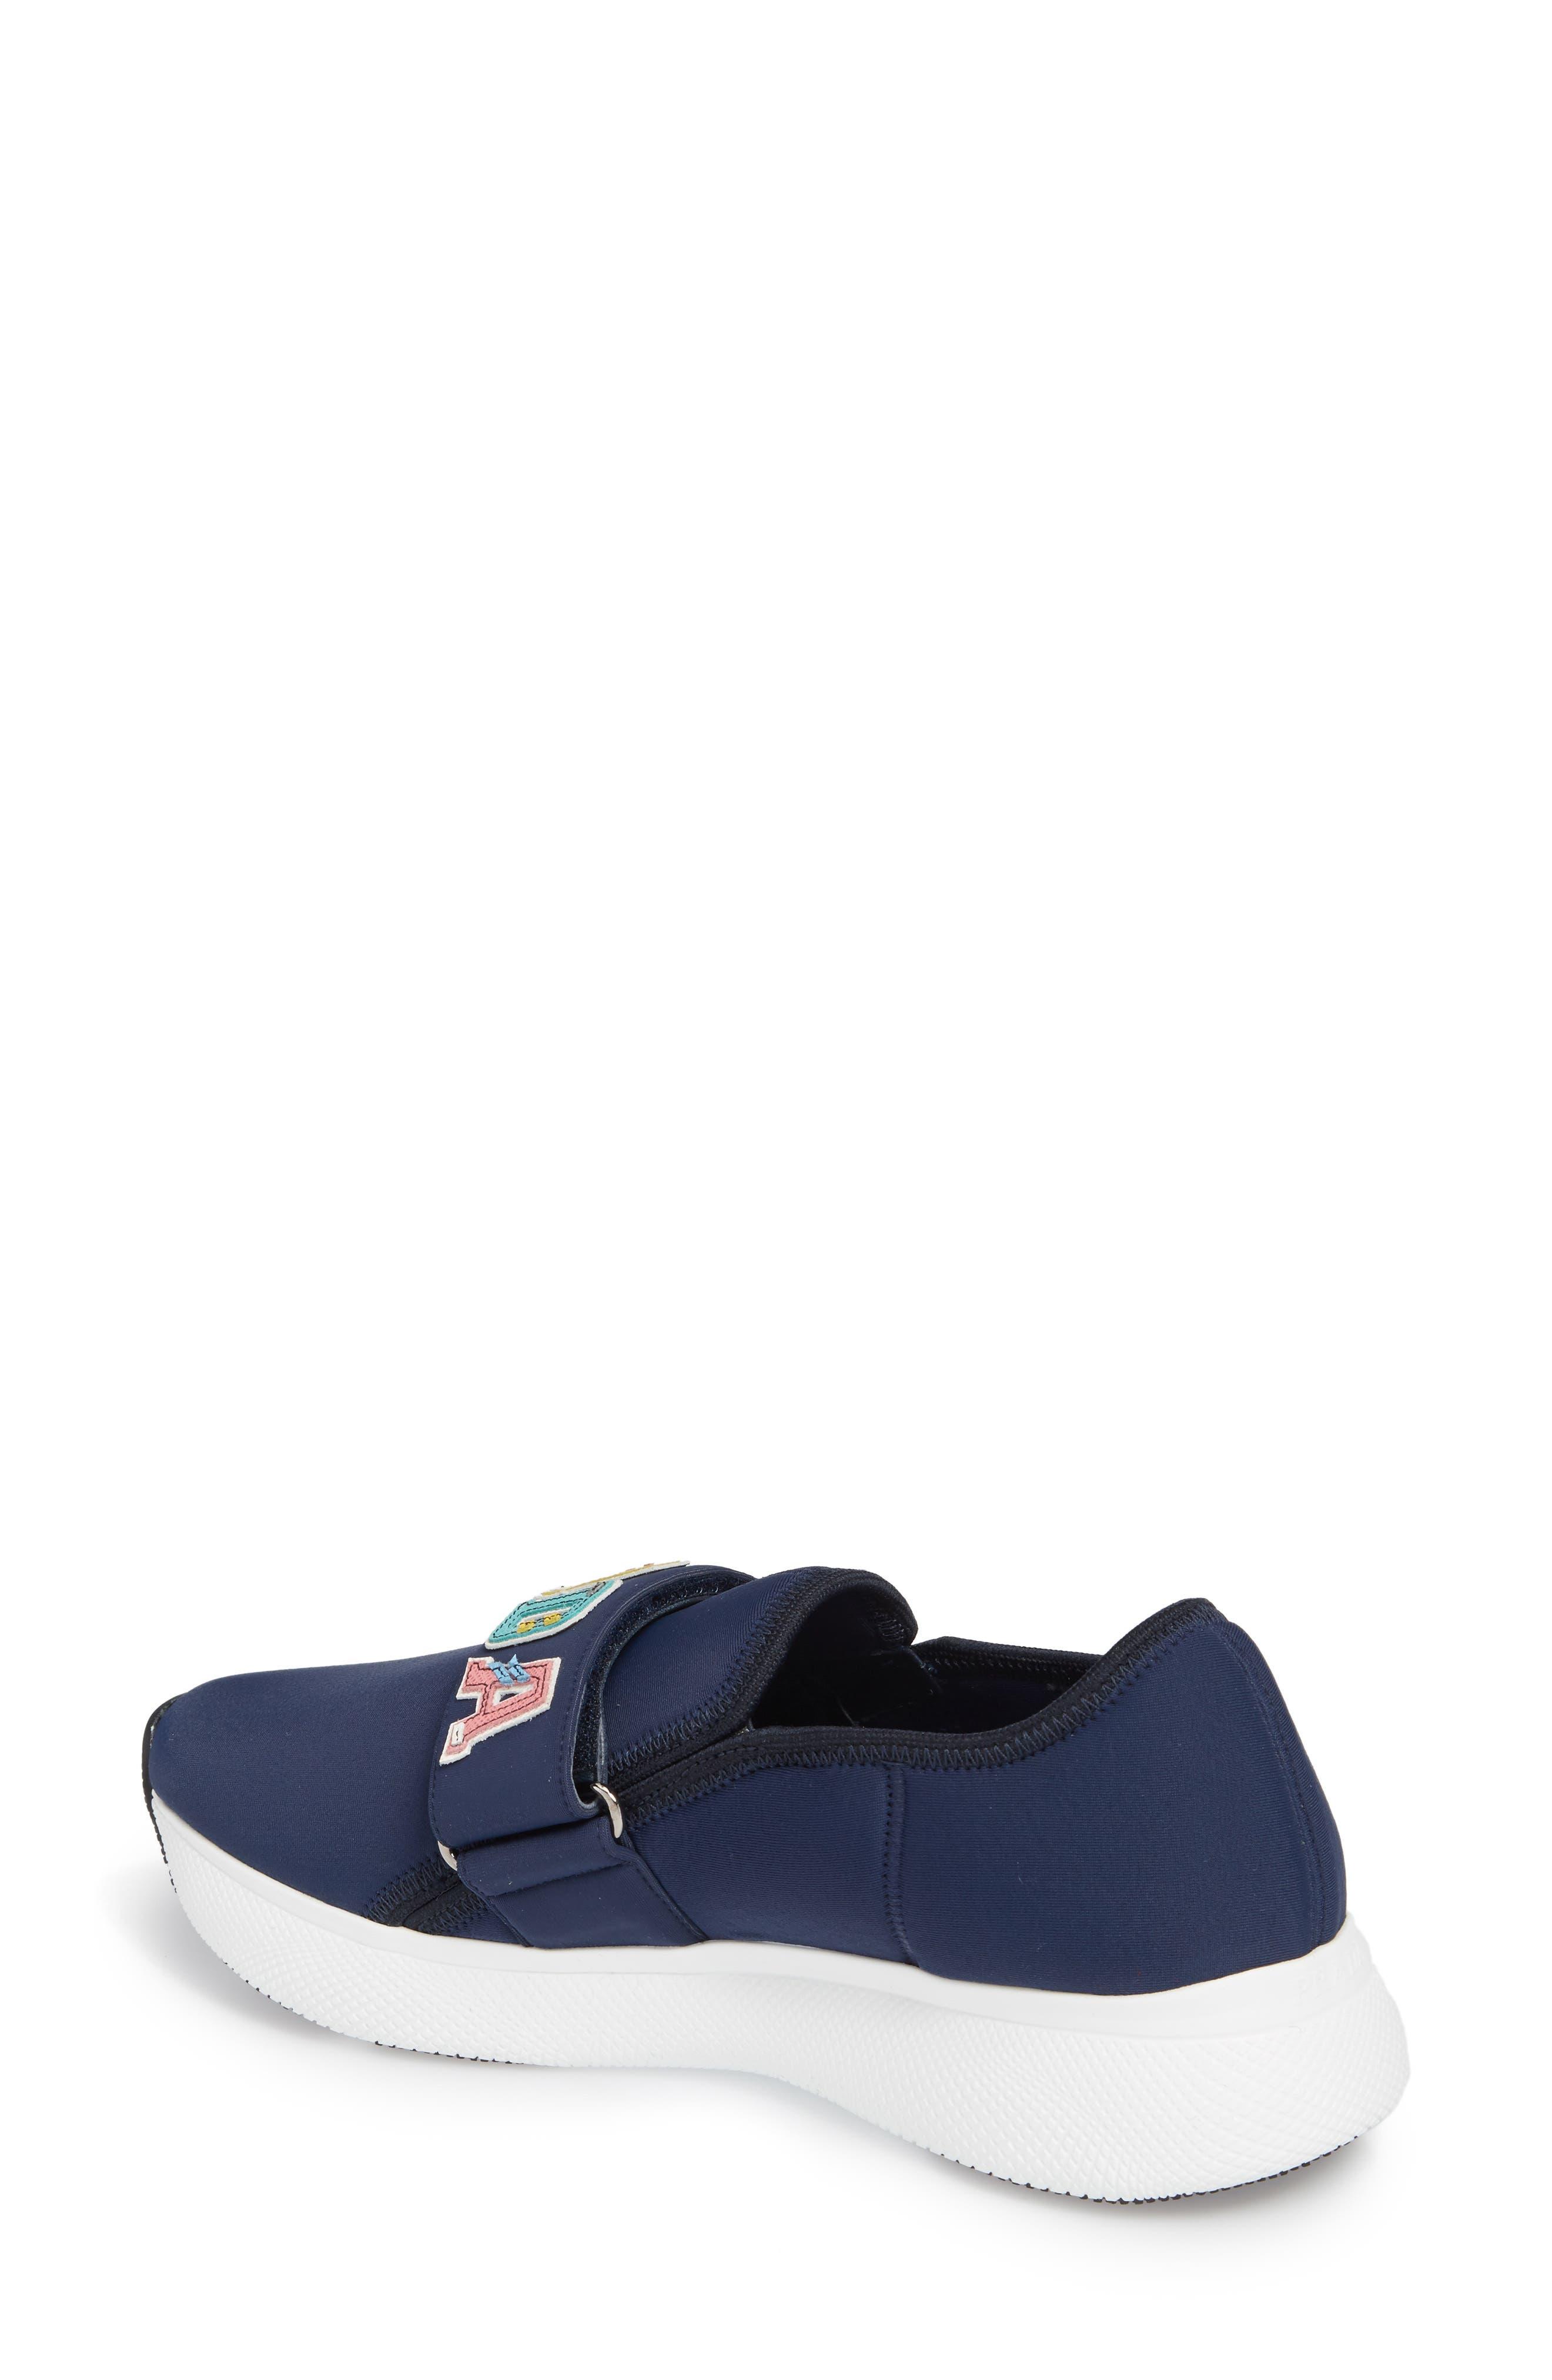 Alternate Image 2  - Prada Logo Strap Low Top Sneaker (Women)